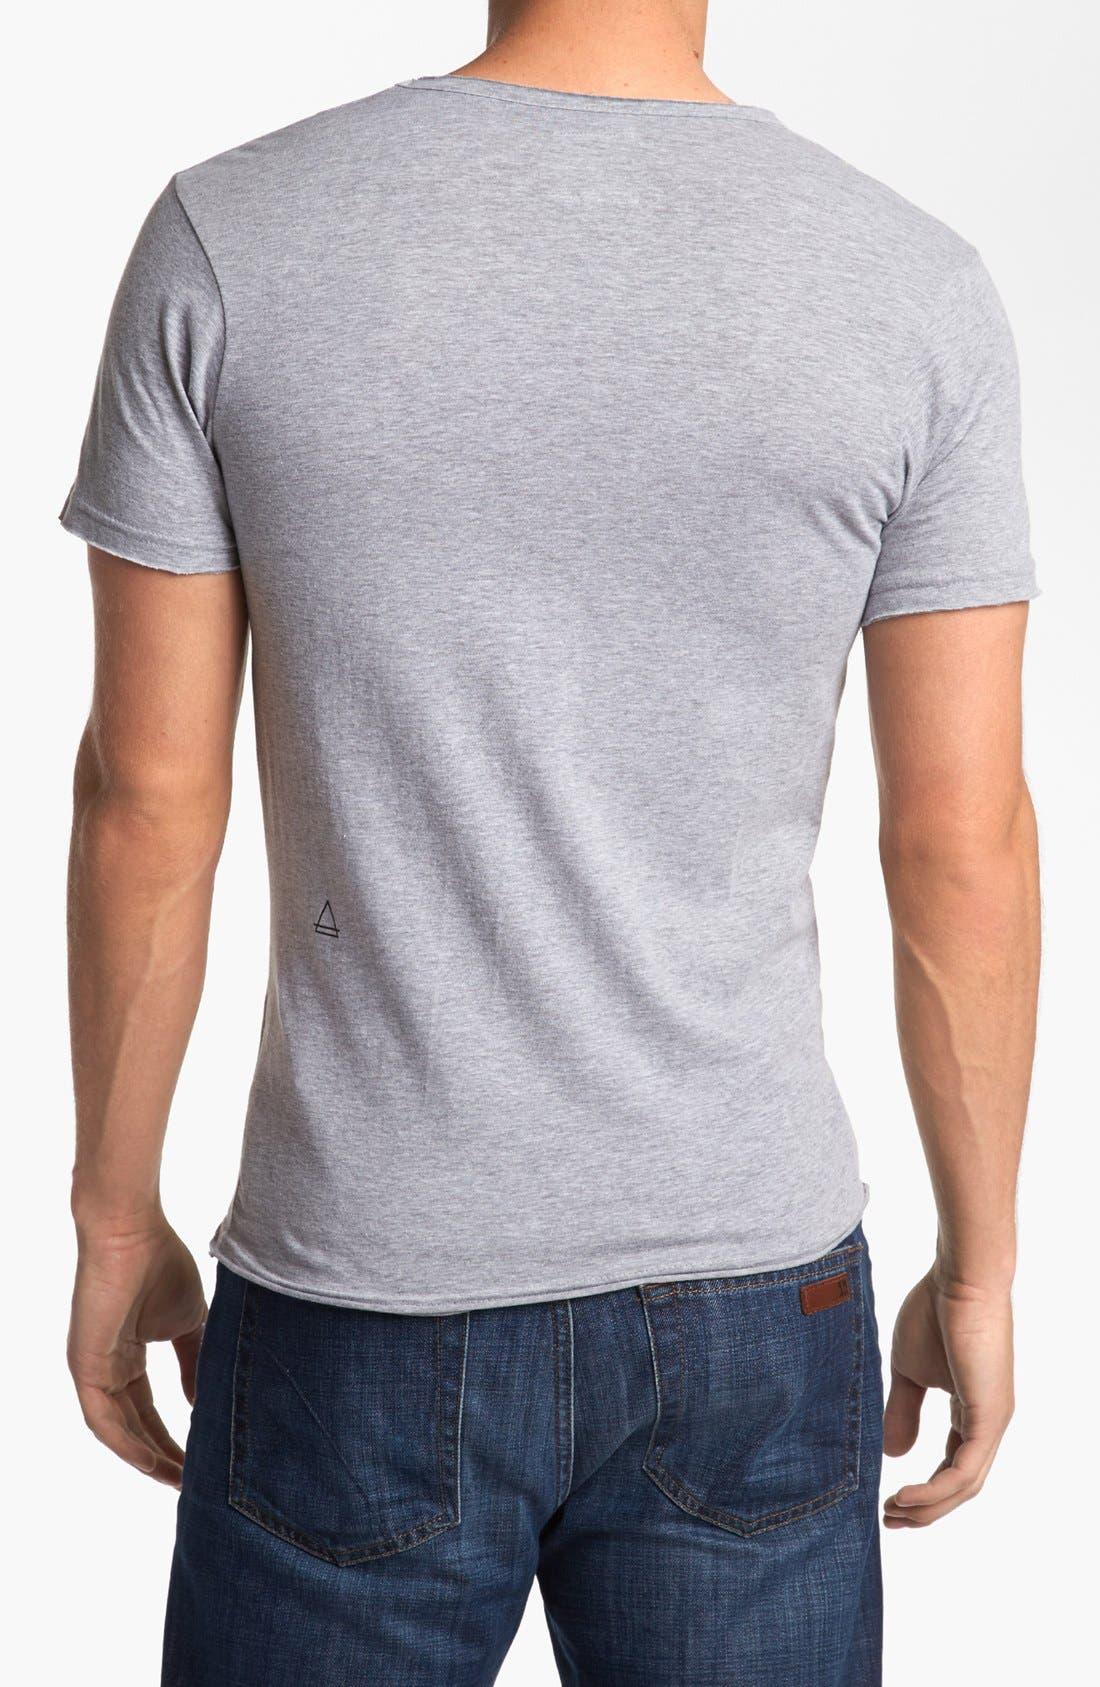 Alternate Image 2  - ELEVENPARIS 'El Bandito' V-Neck T-Shirt